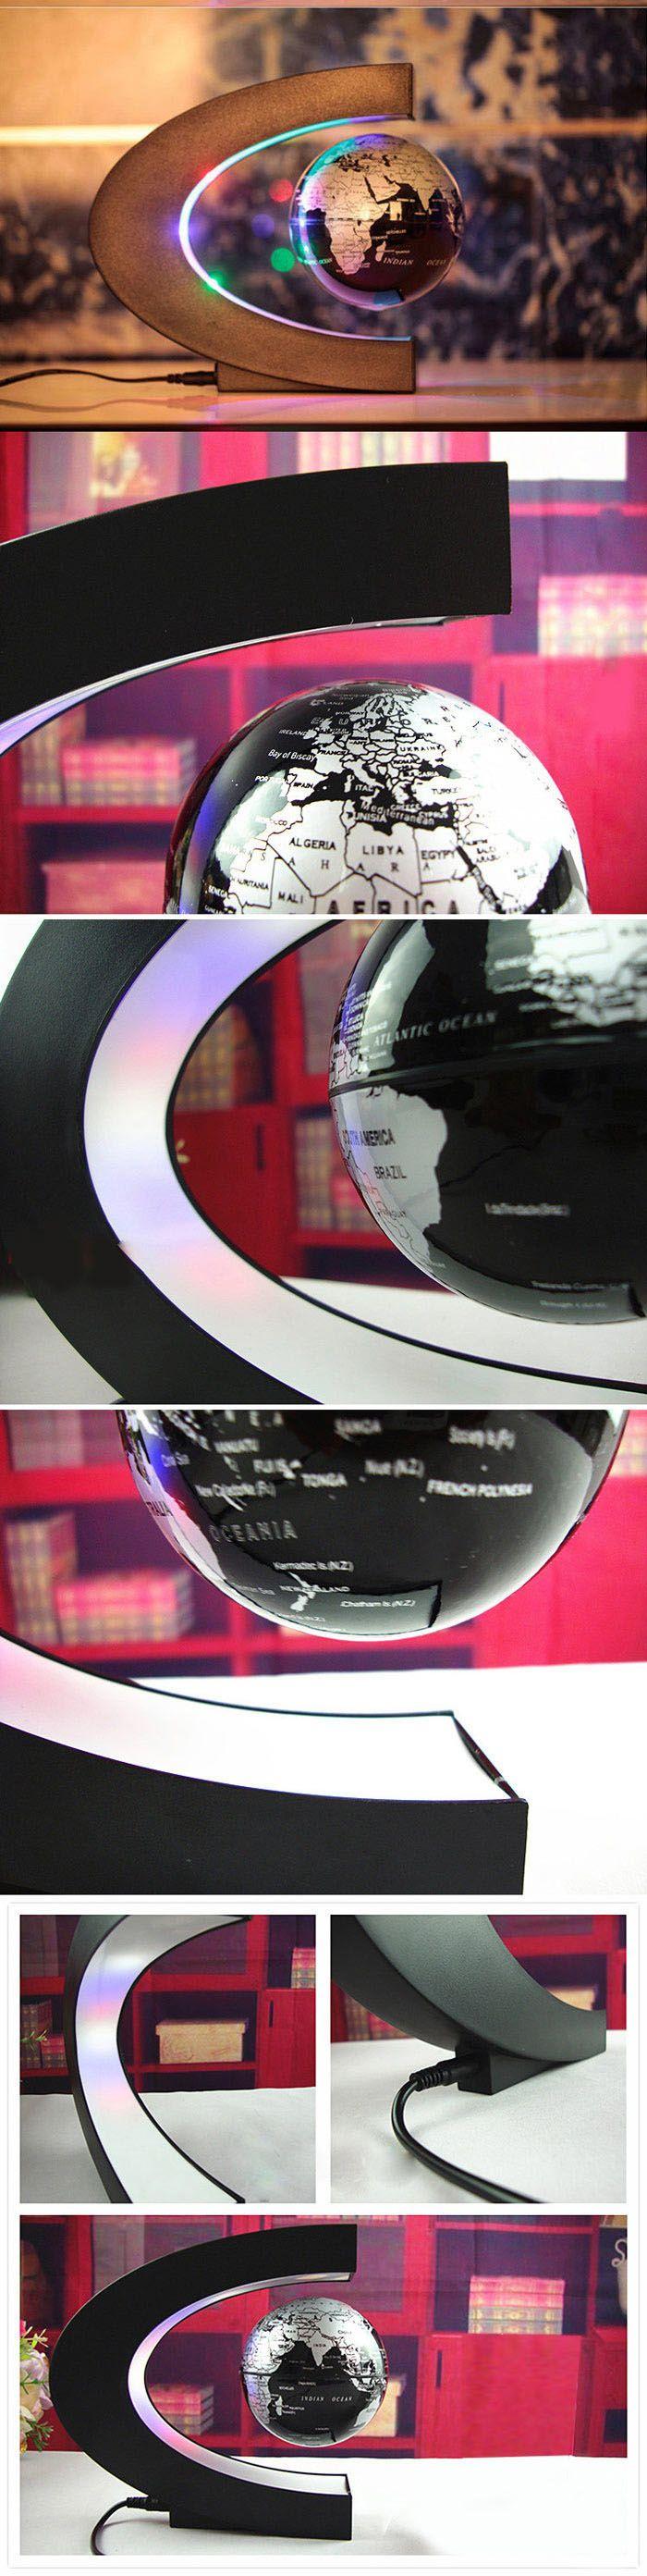 Creative C Shape Magnetic Levitation Floating Globe World Map with Colorful LED Light for Desk Decoration